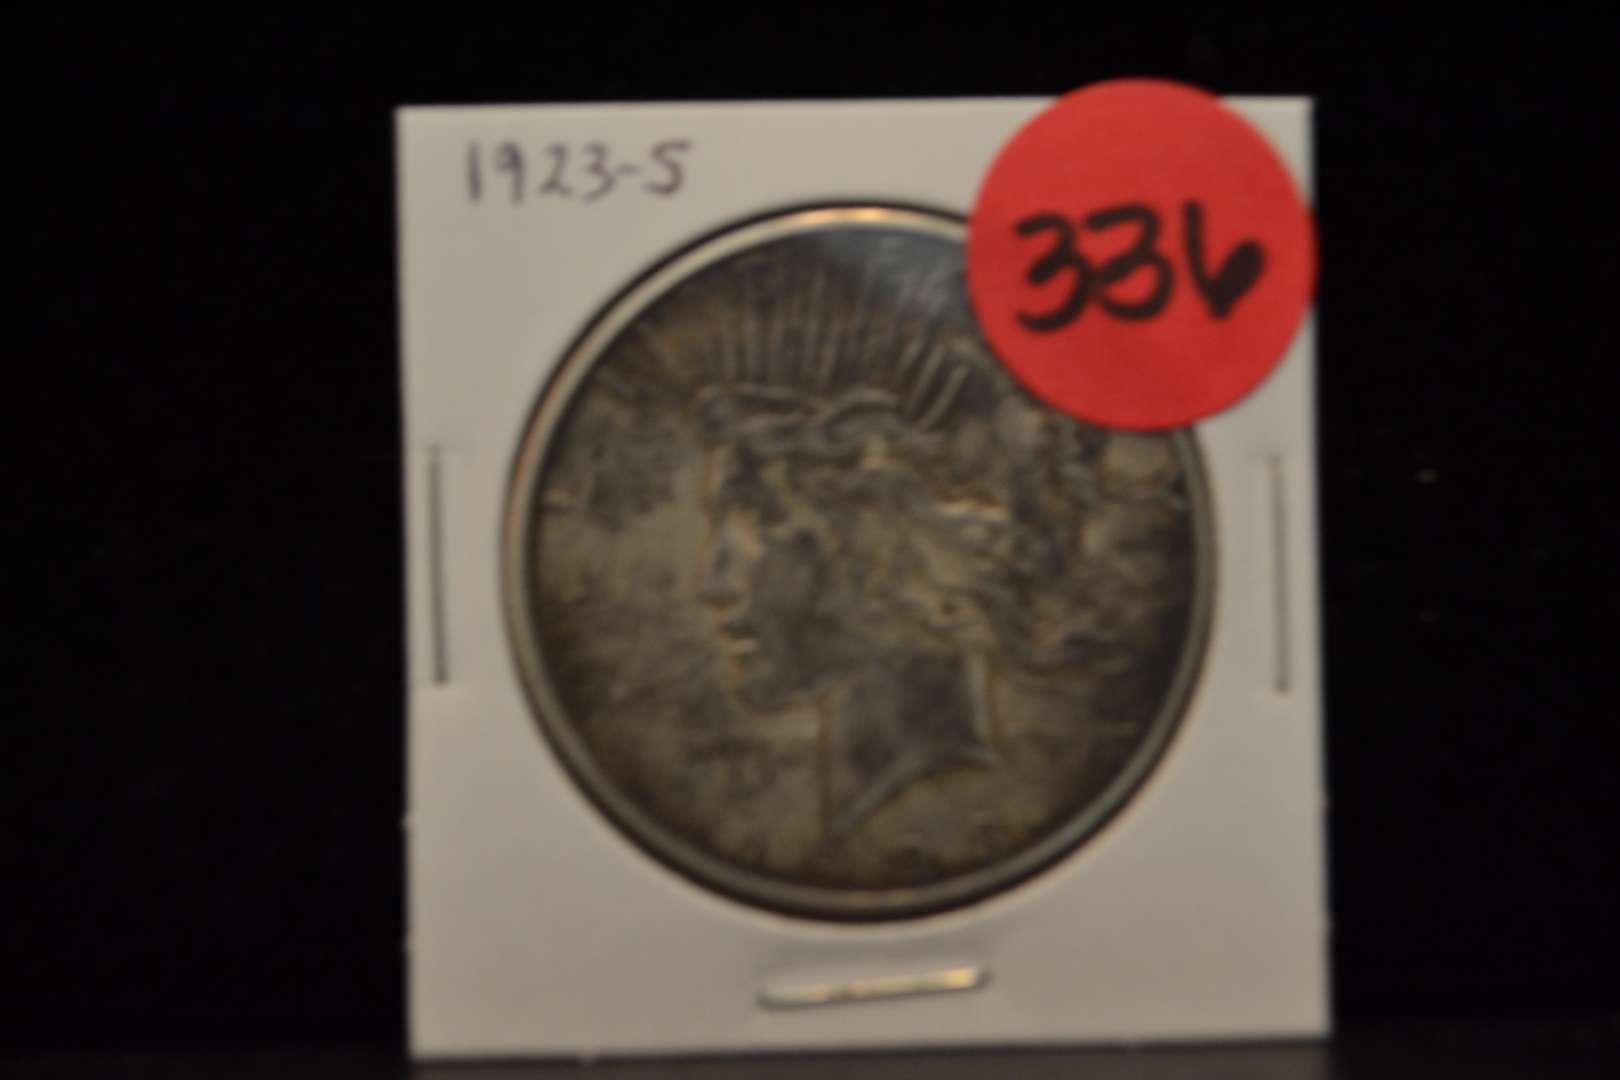 Lot # 336 1923 SILVER PEACE DOLLAR